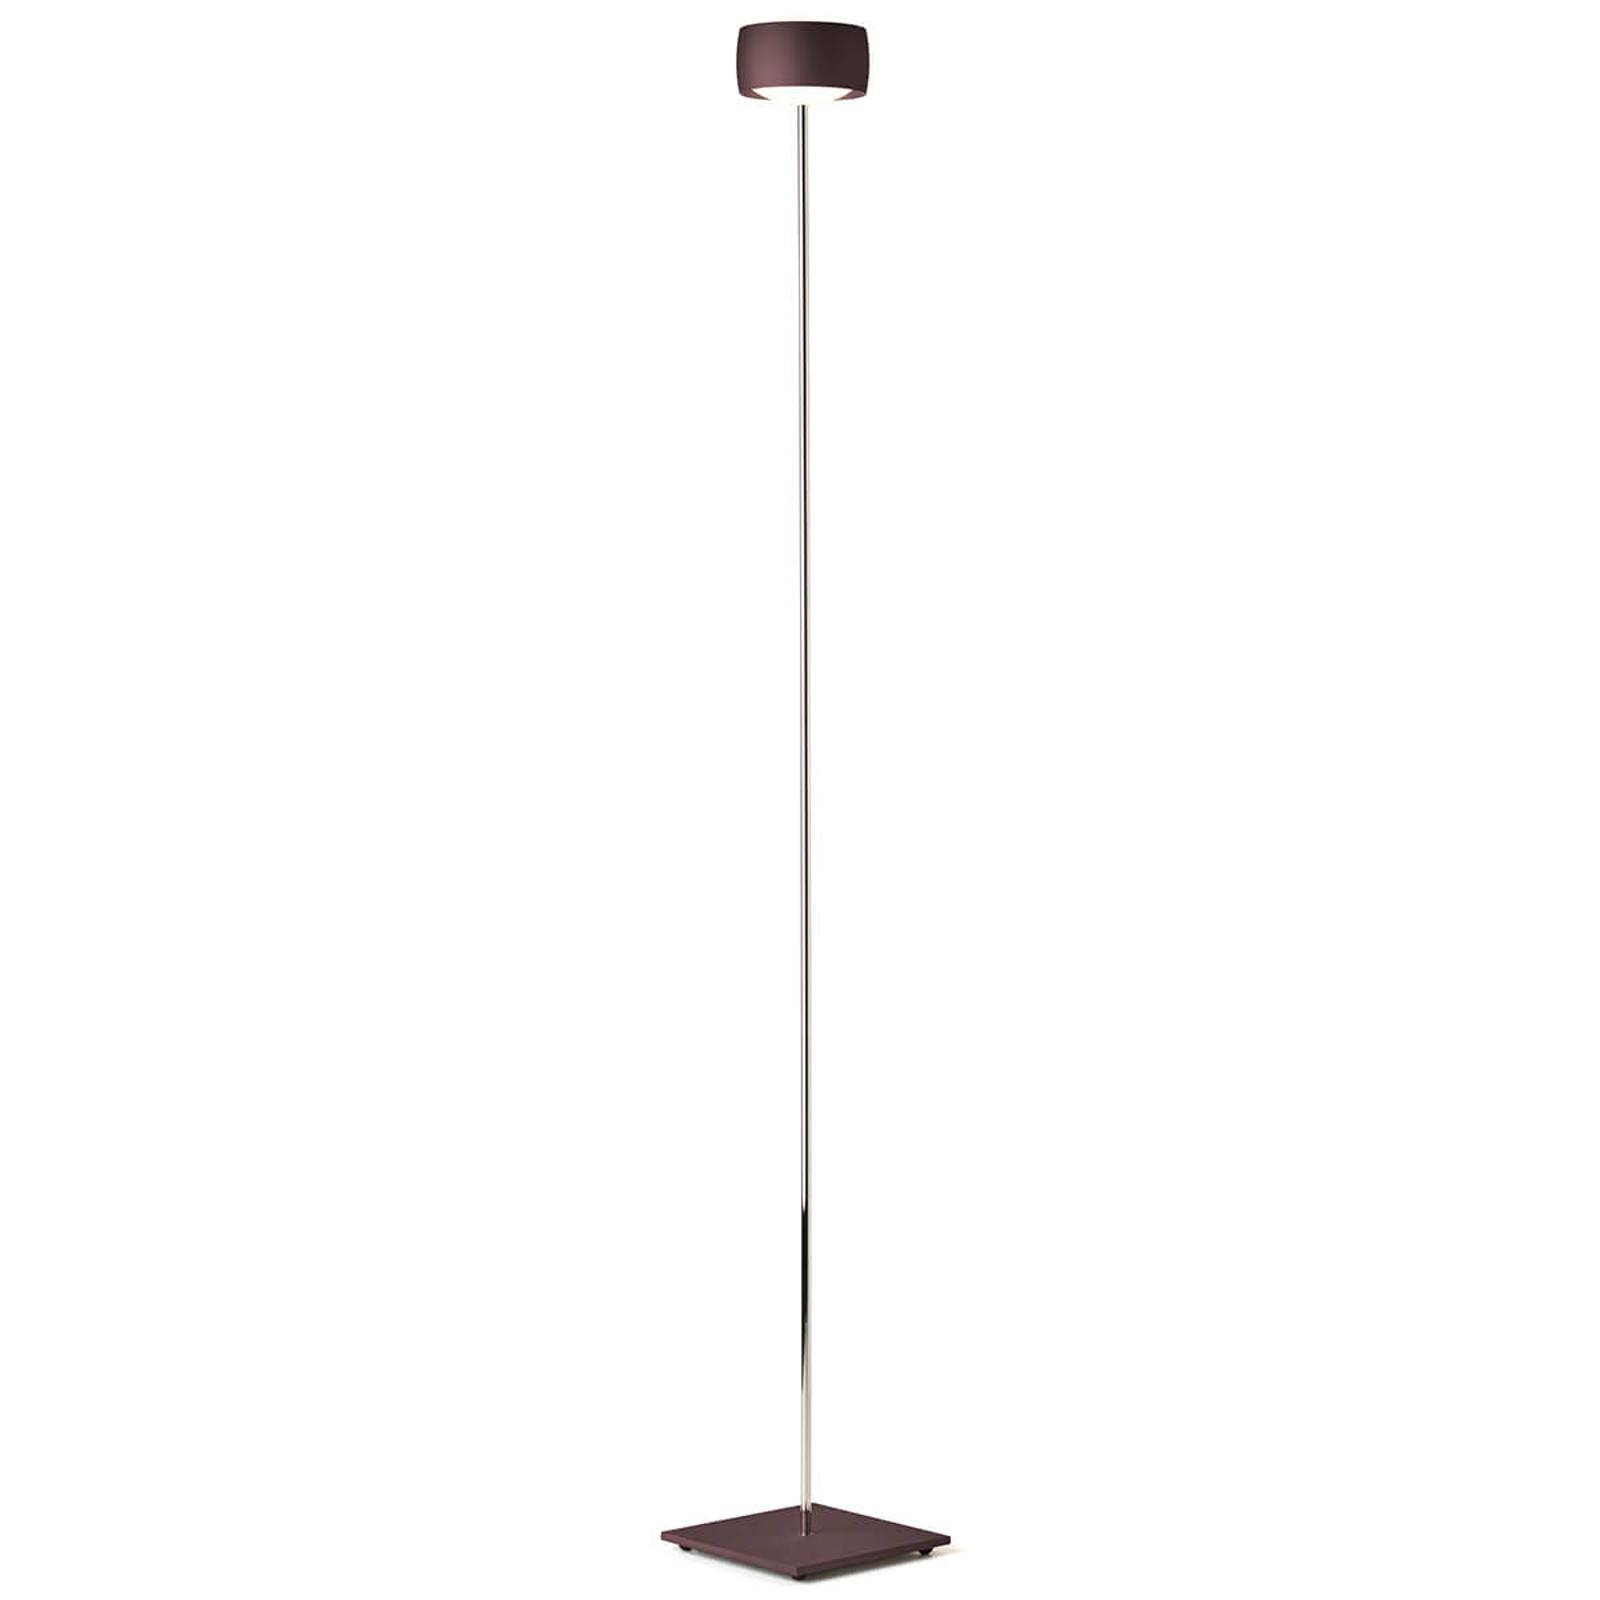 OLIGO Grace LED-Stehlampe Gestensteuerung espresso